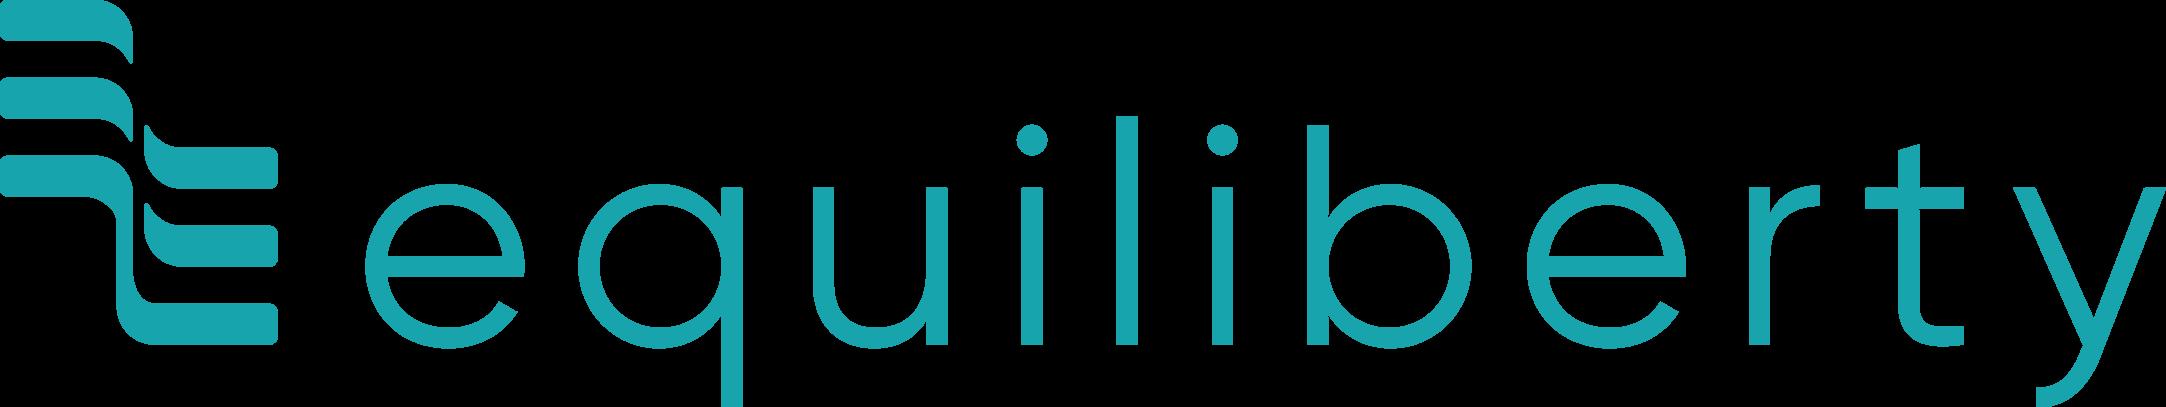 Equiliberty-company-logo